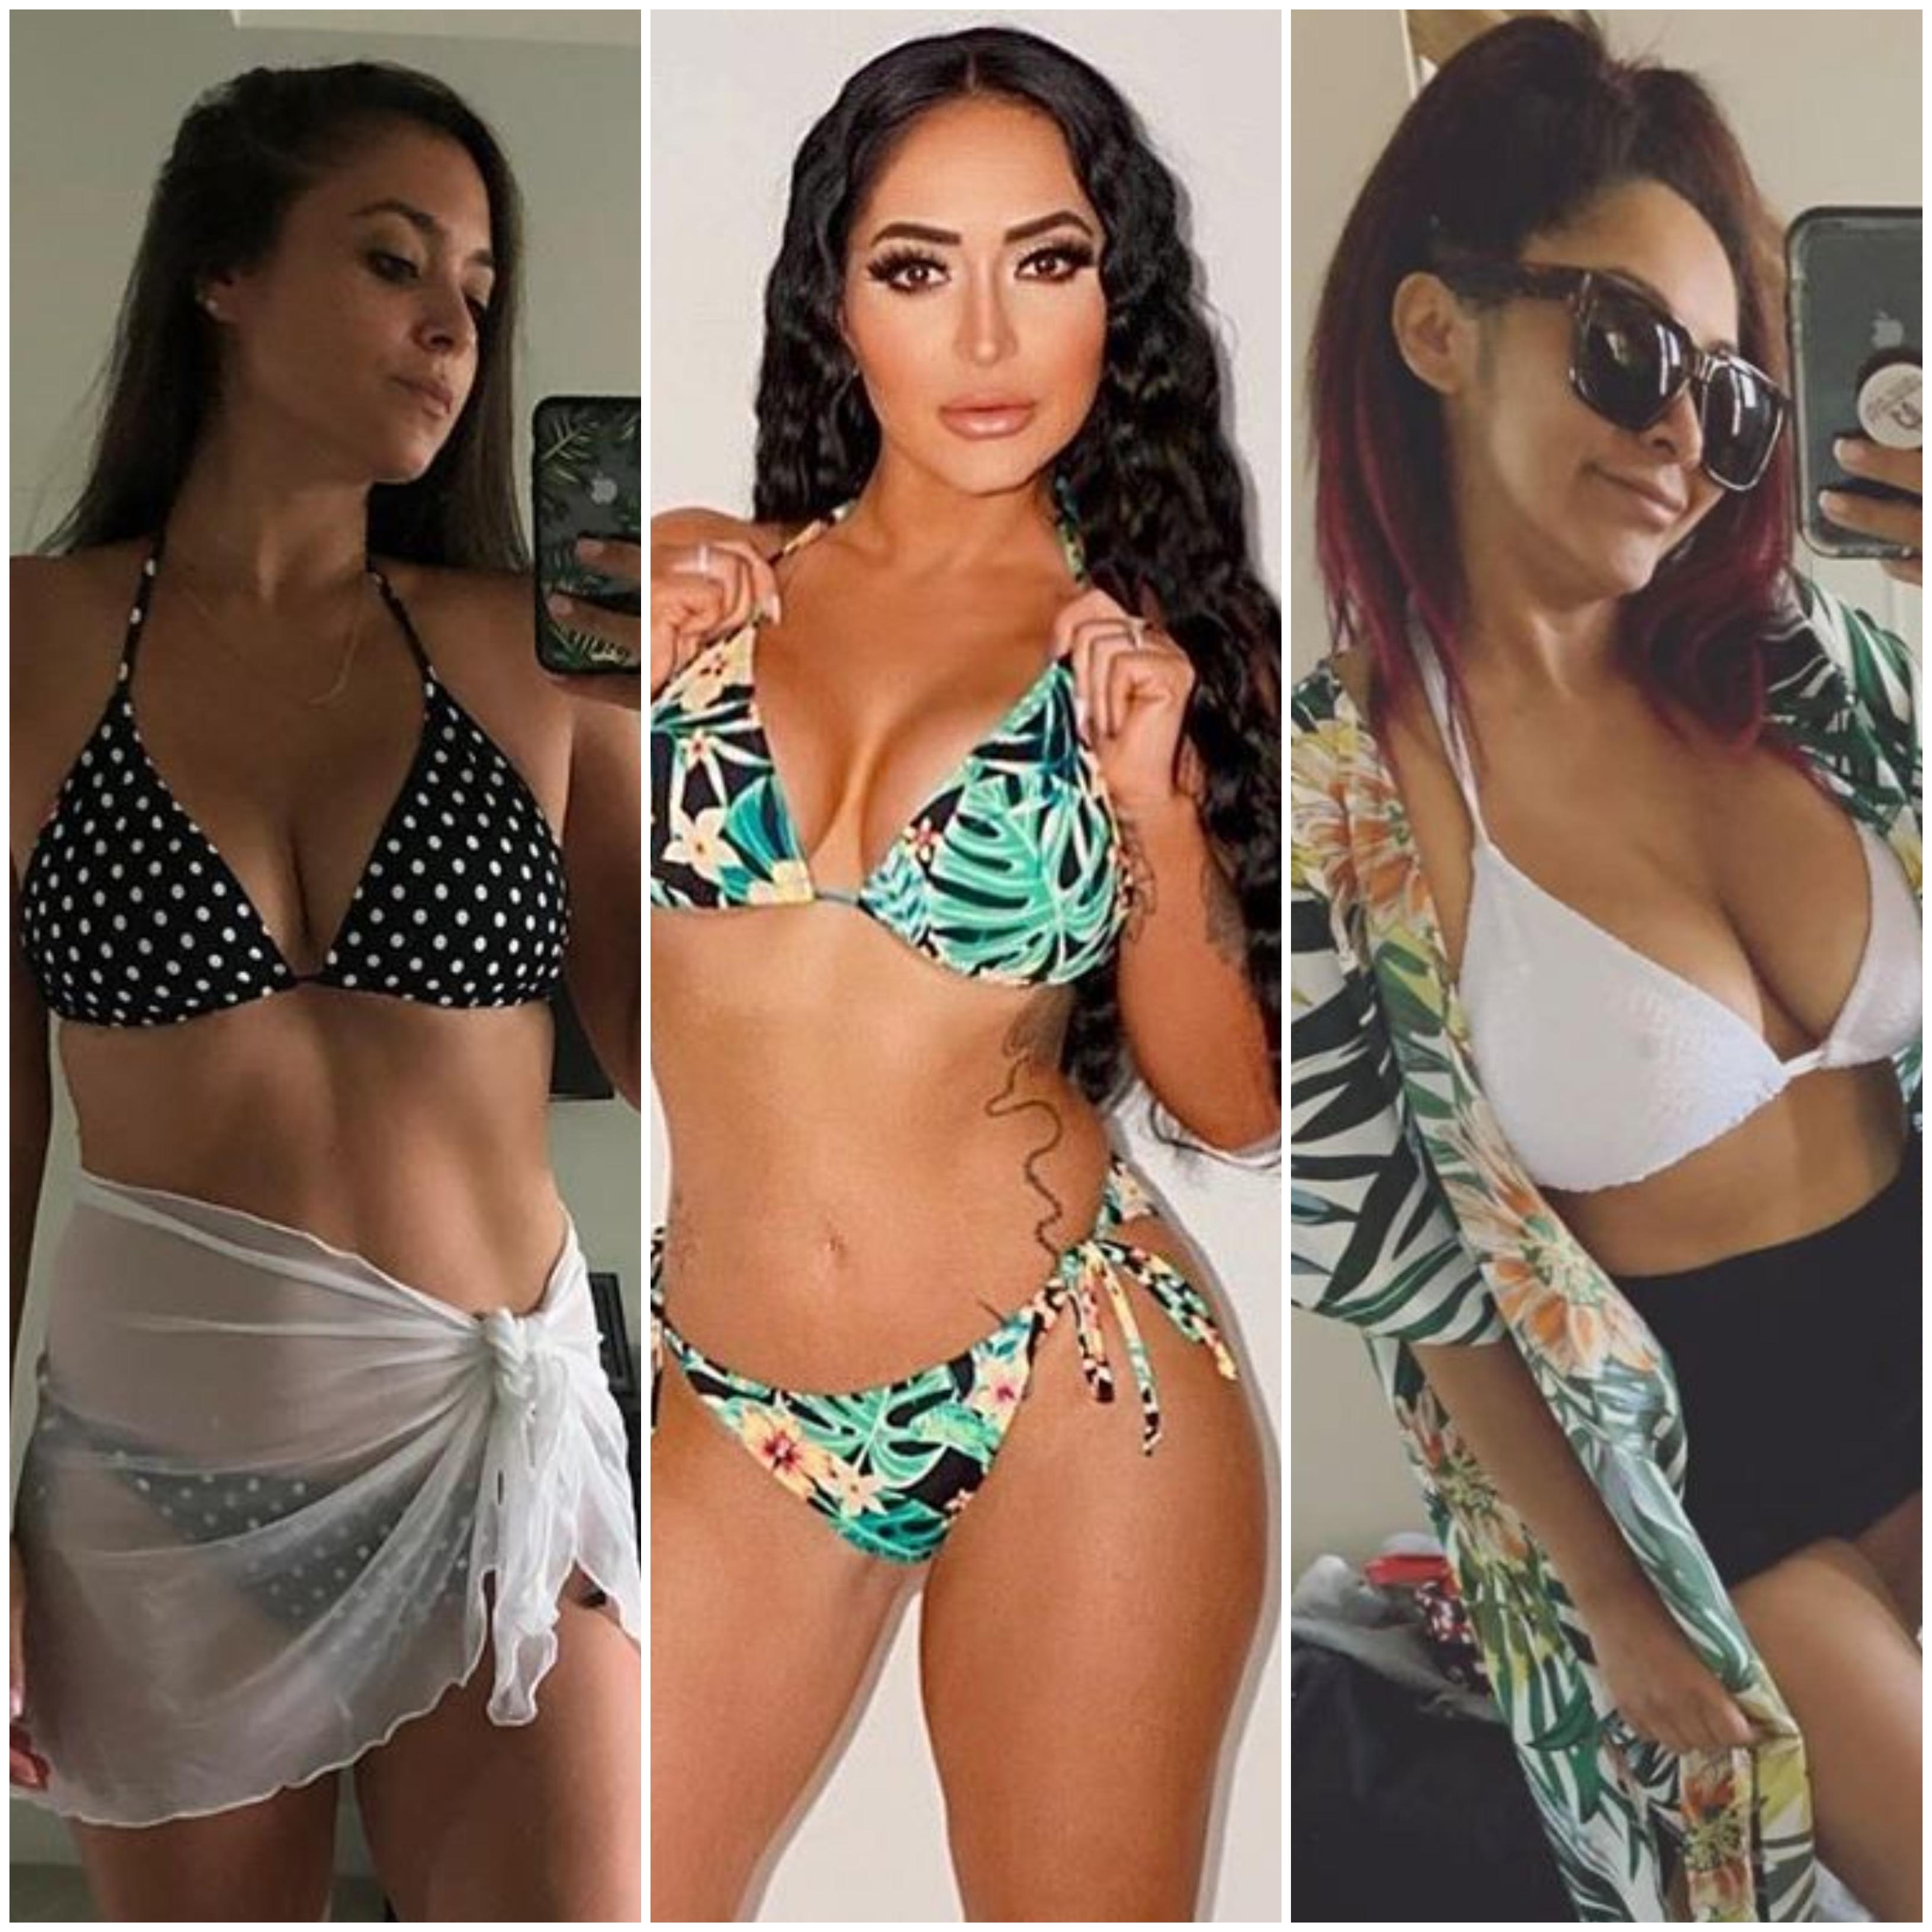 Jersey Shore's Hottest Bikini Photos: Snooki, JWoww, Deena and More